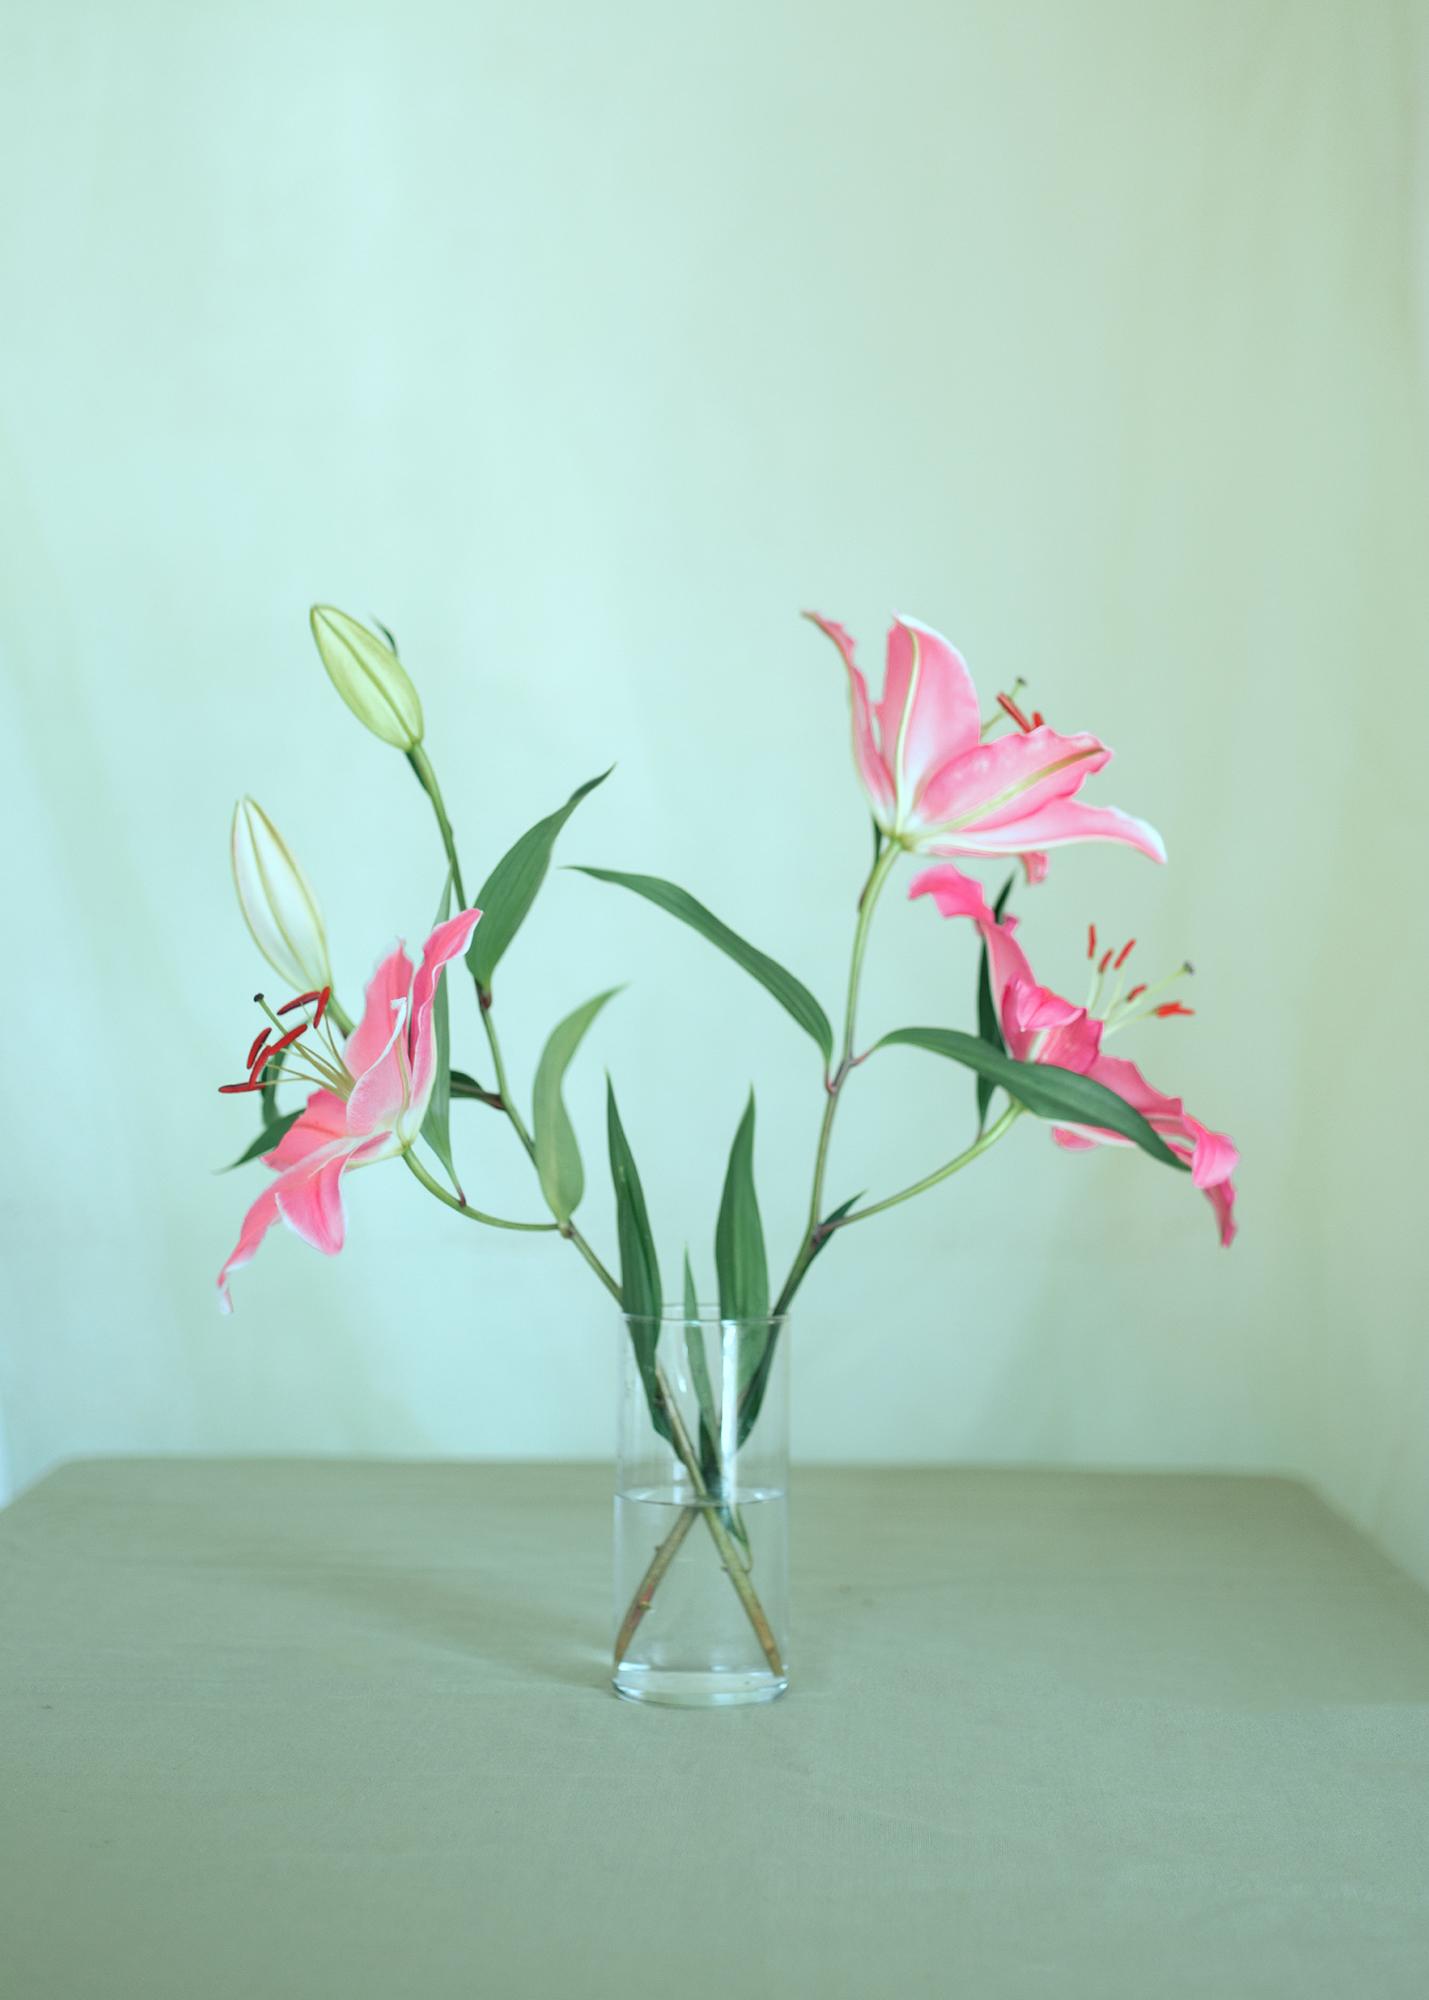 ©Erika Orozco | The Beauty of Botany